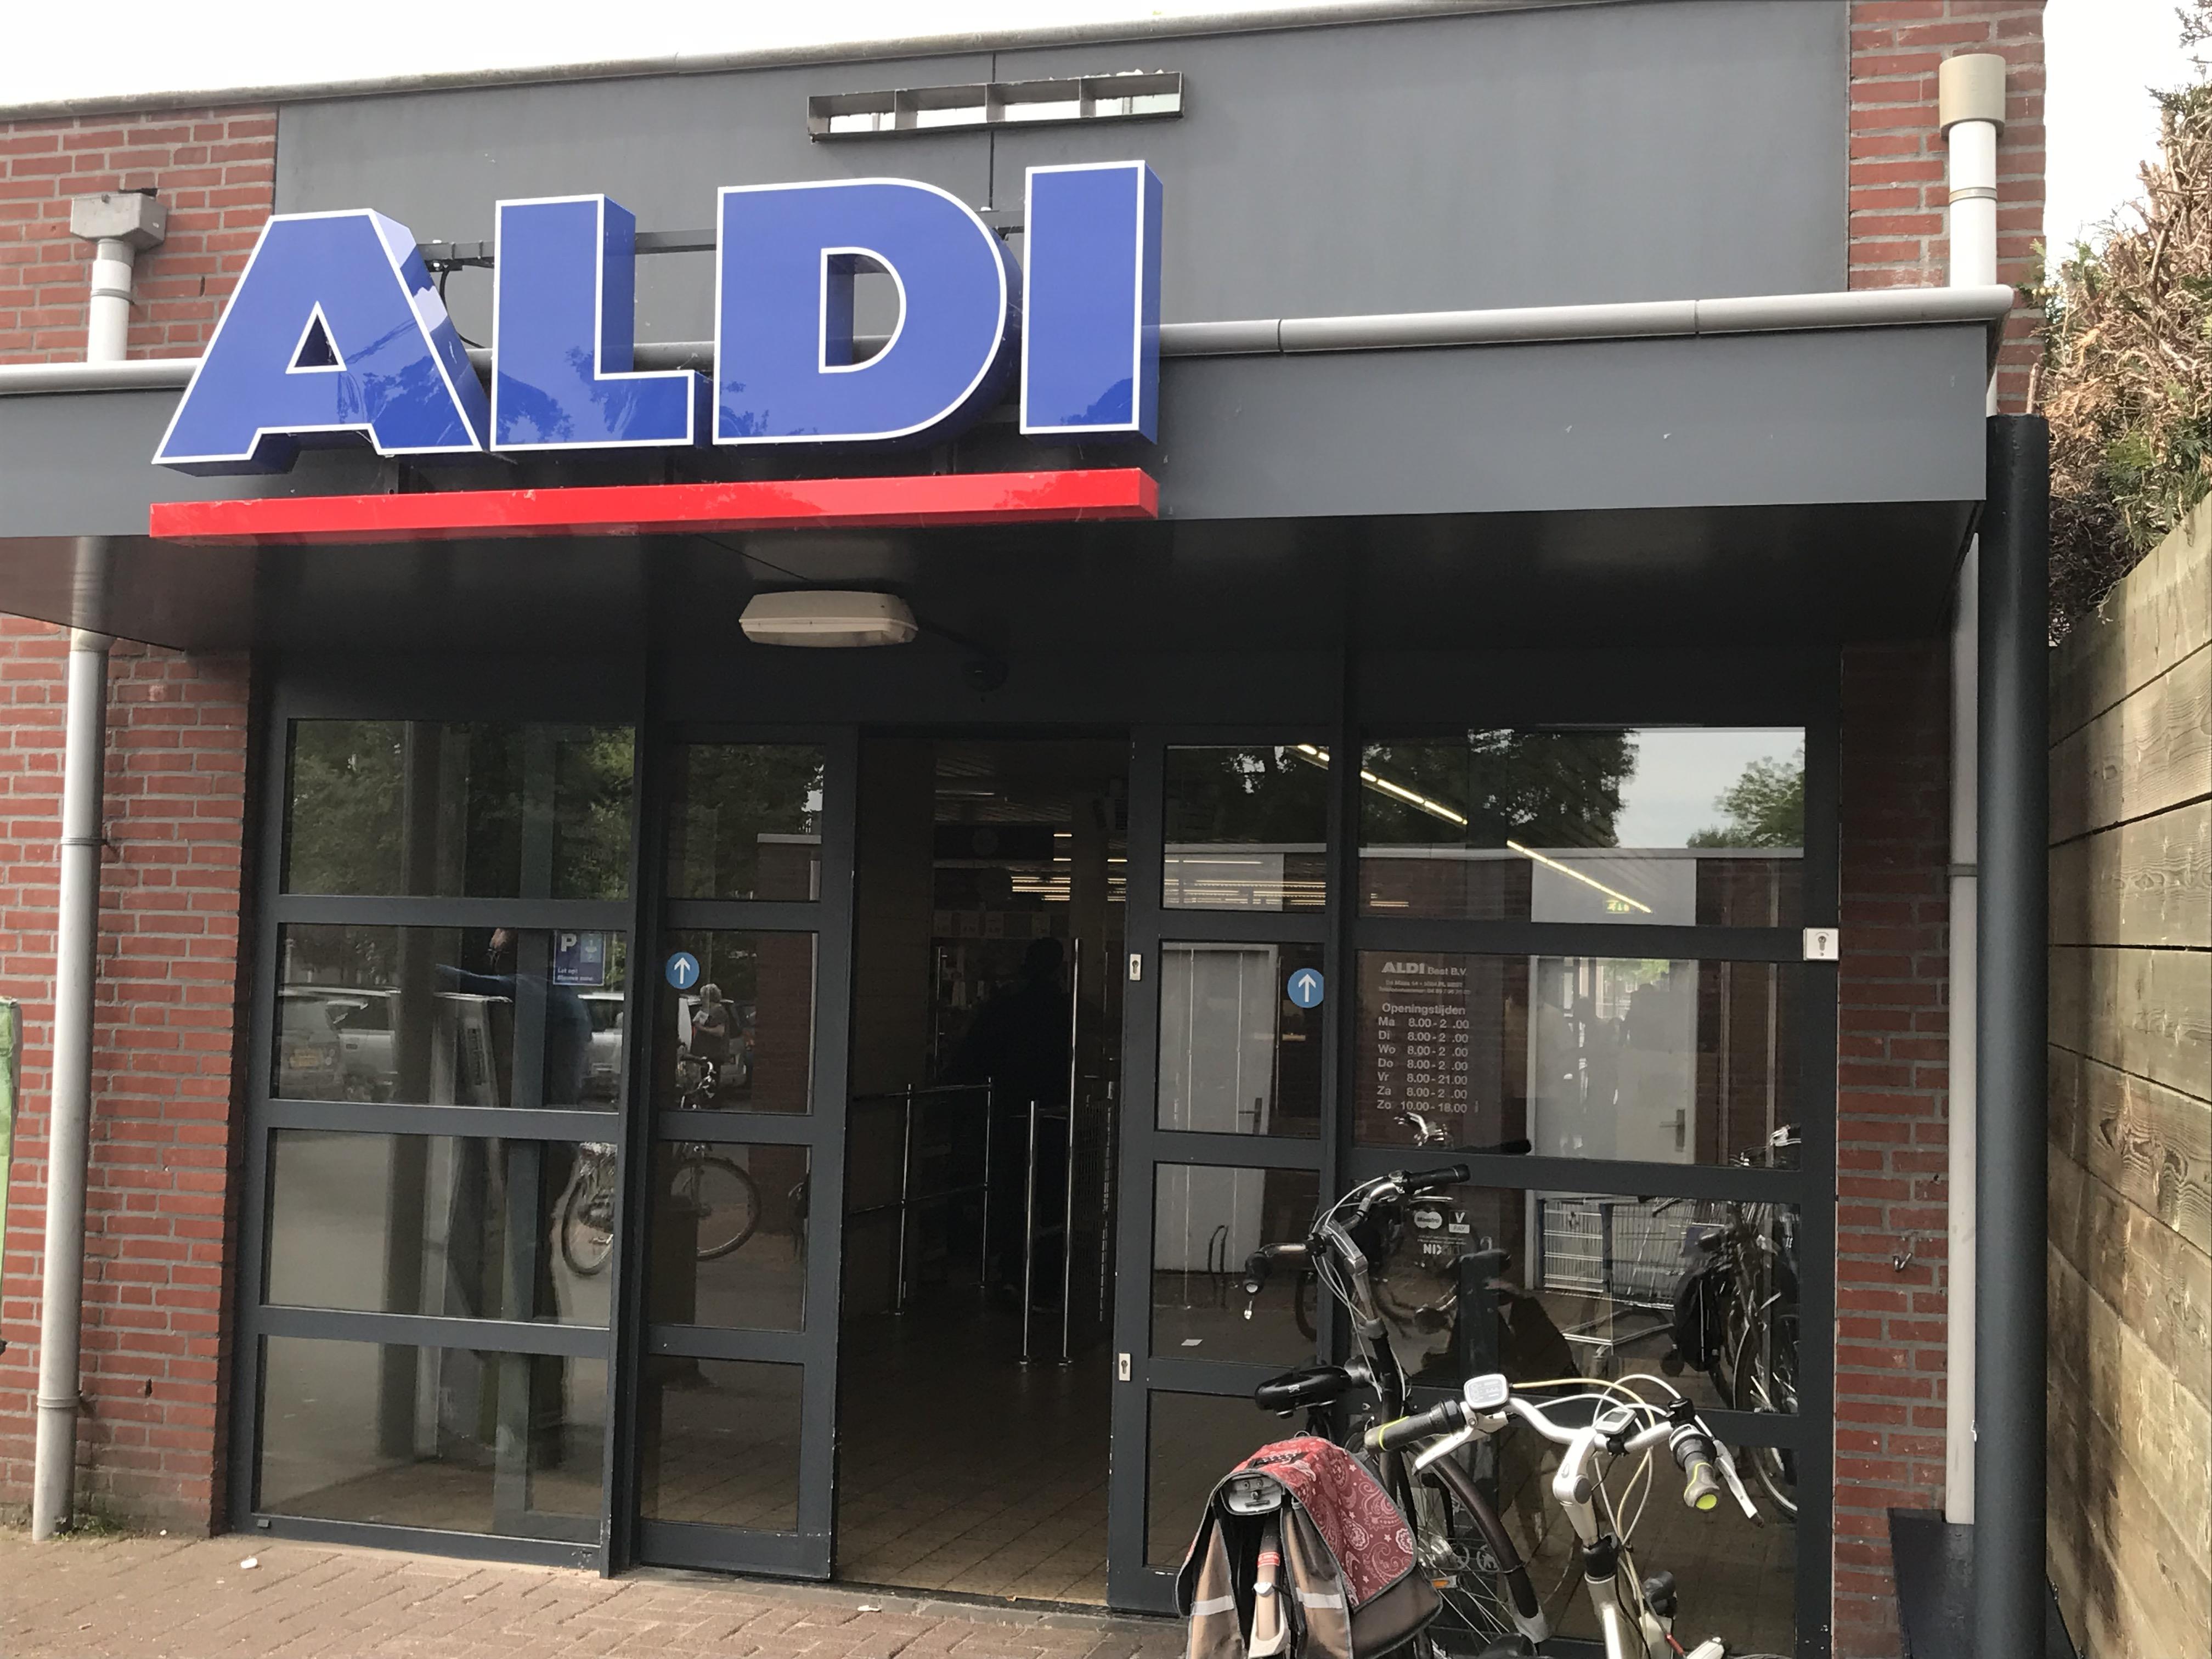 Aldi, Supermarkt